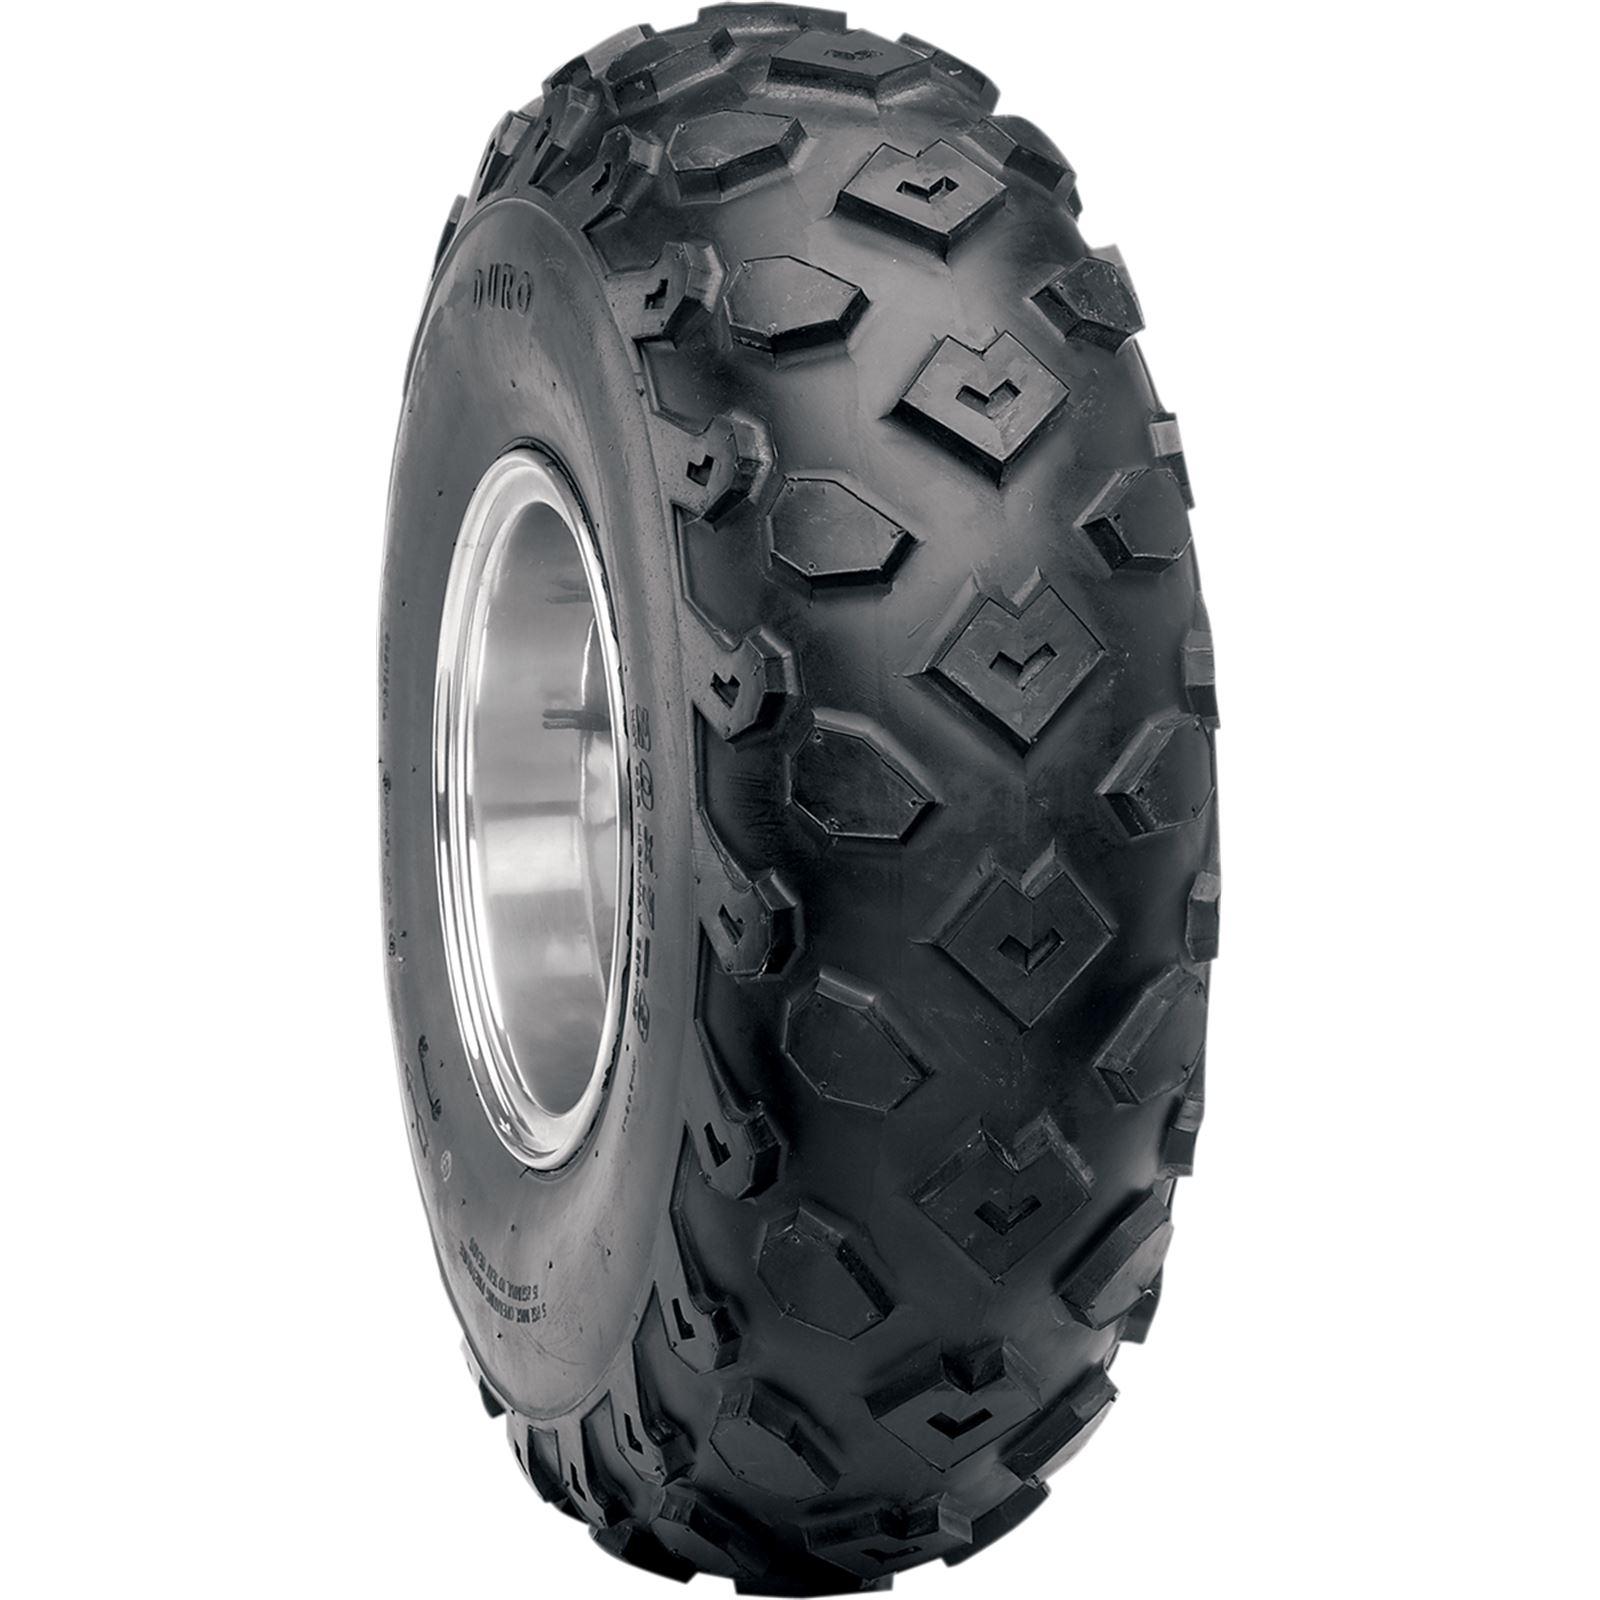 Duro Tire HF246 - 20X7-8 - 2 Ply